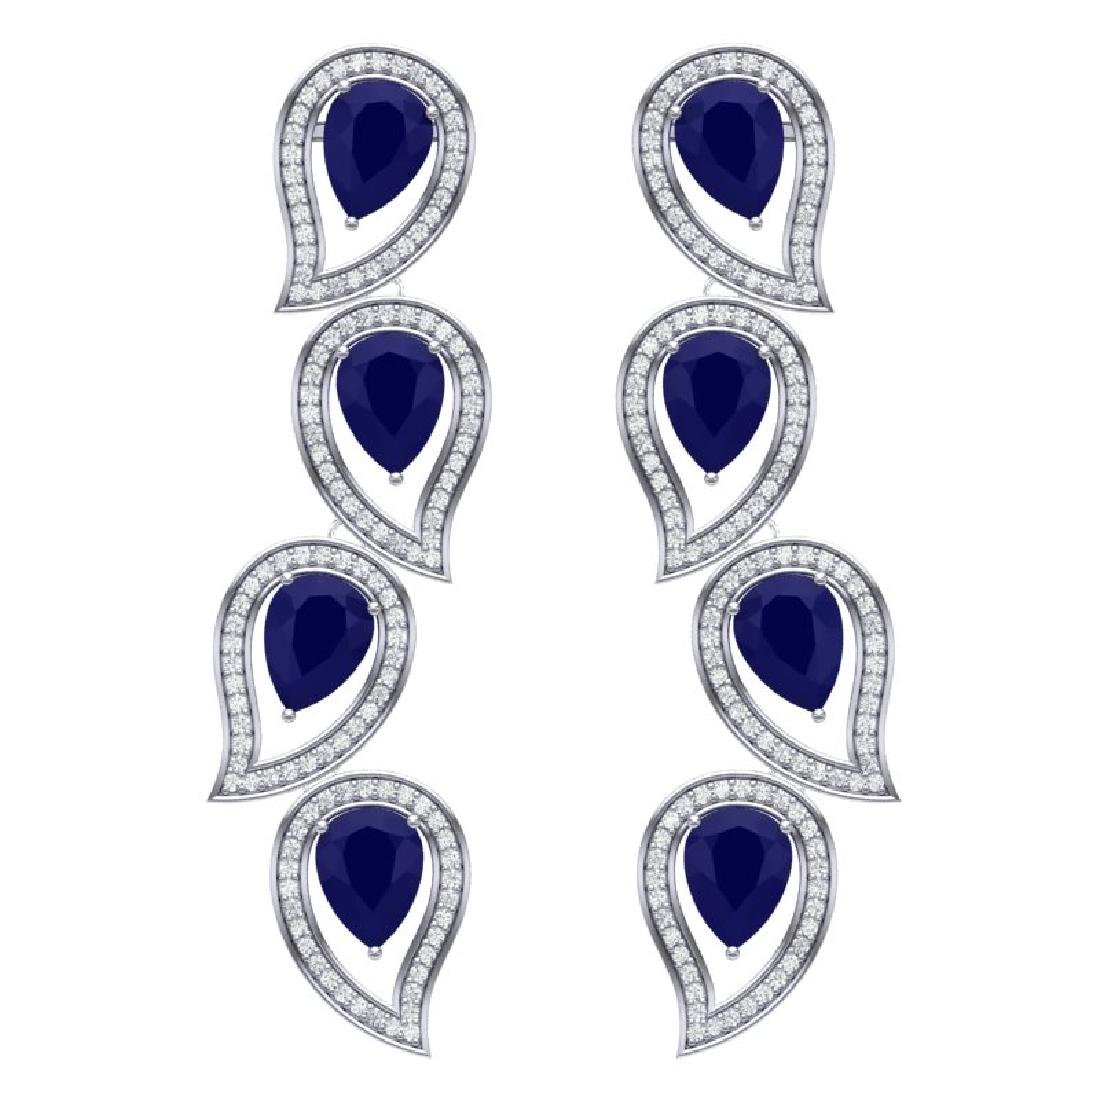 16.44 CTW Royalty Sapphire & VS Diamond Earrings 18K